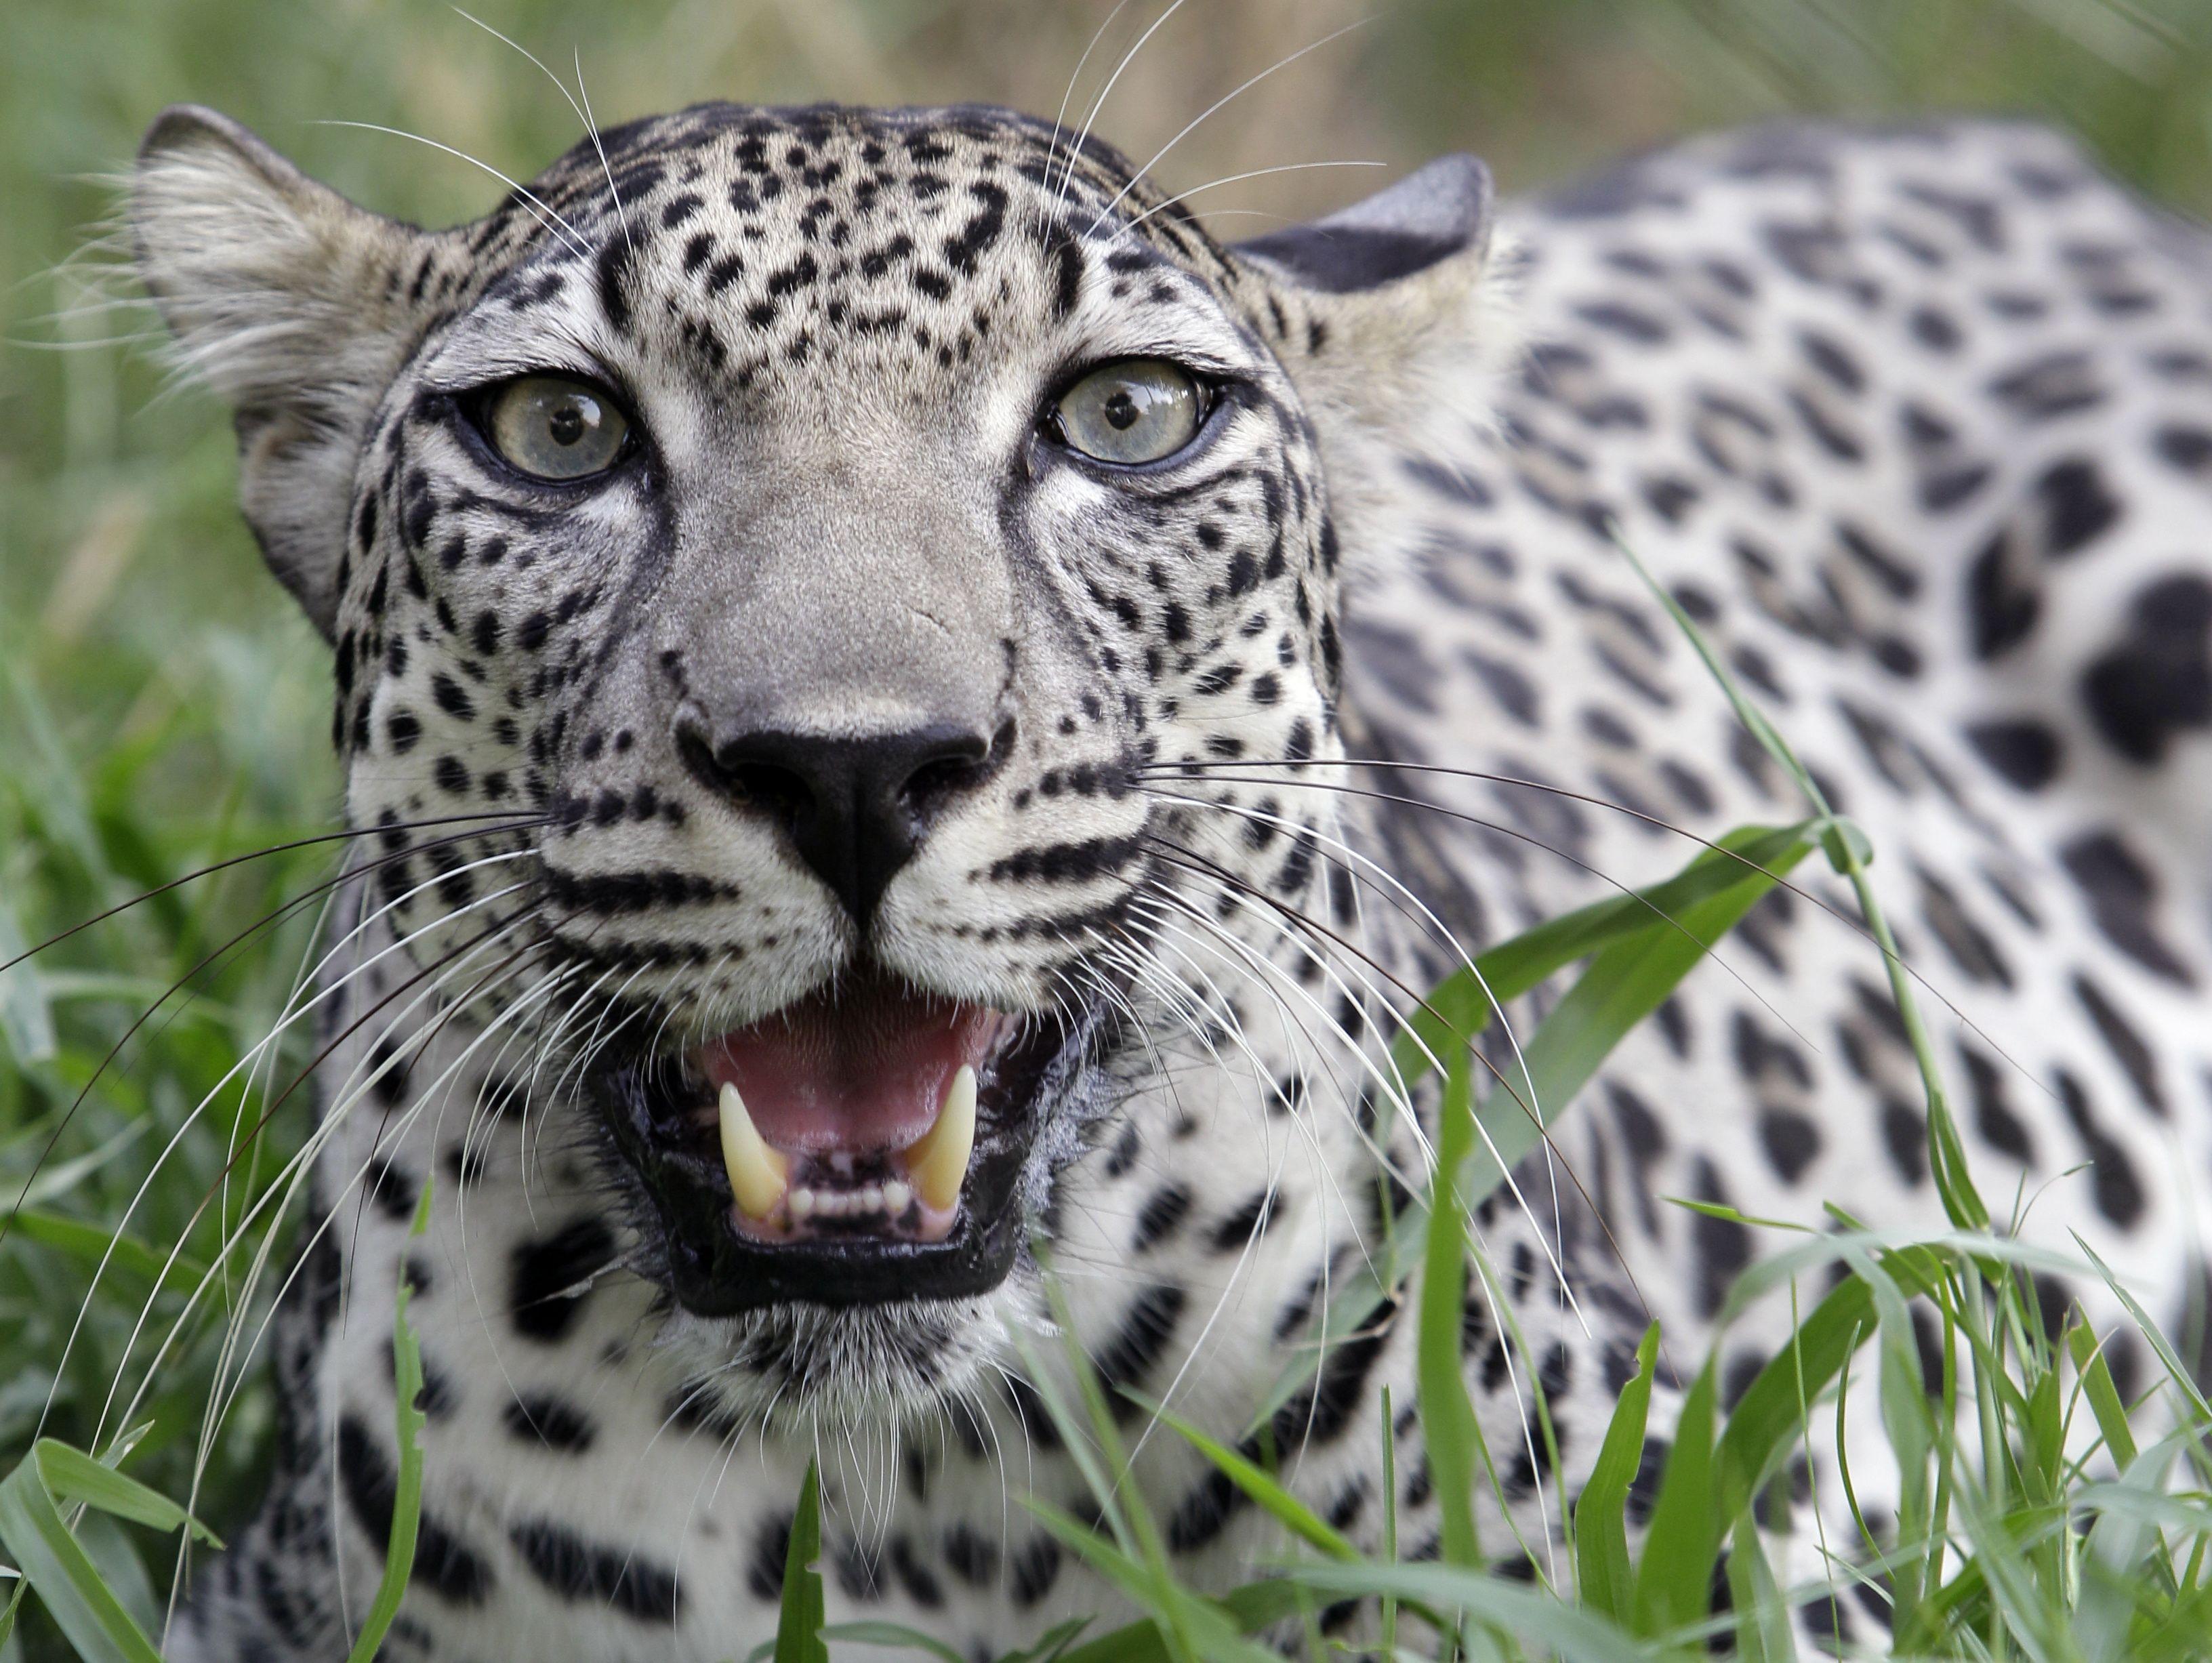 Arabian leopard (Panthera pardus nimr) //Genus Panthera pardus ...